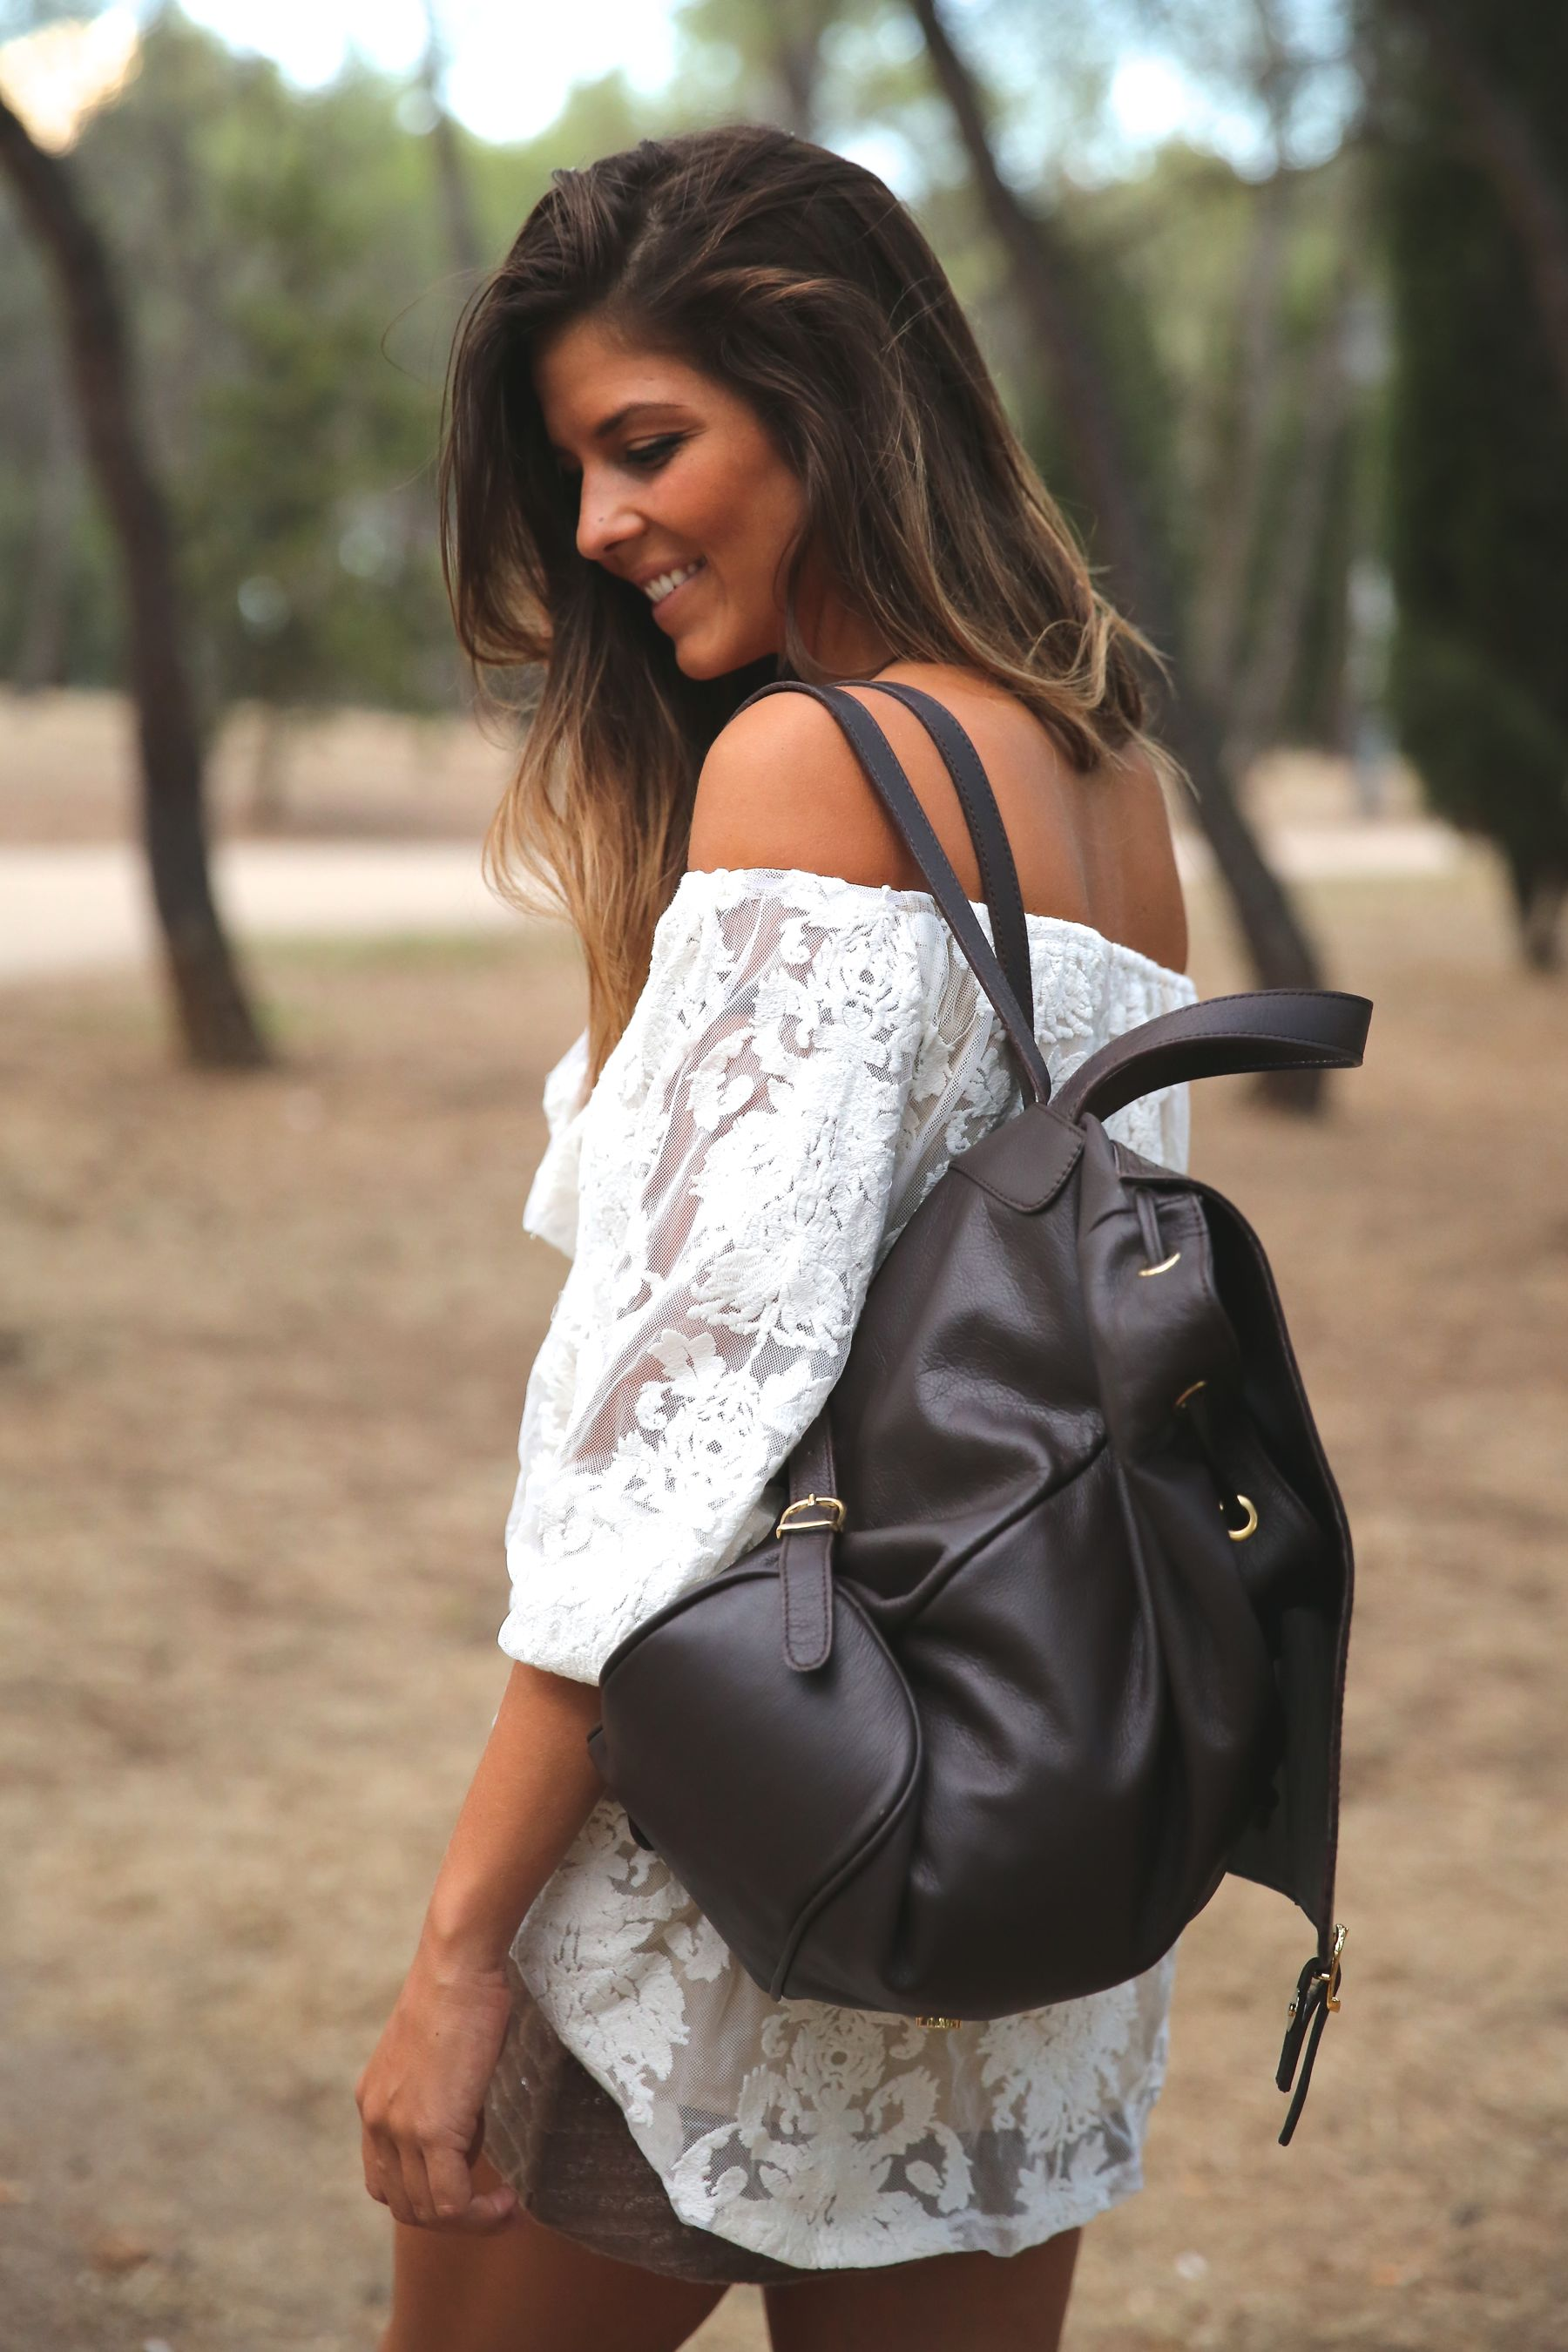 trendy_taste-look-outfit-street_style-ootd-blog-blogger-fashion_spain-moda_españa-primavera/verano-boho-trendy-planes_de_día-lentejuelas-falda-botines-étnico-mochila-crochet-encaje-3